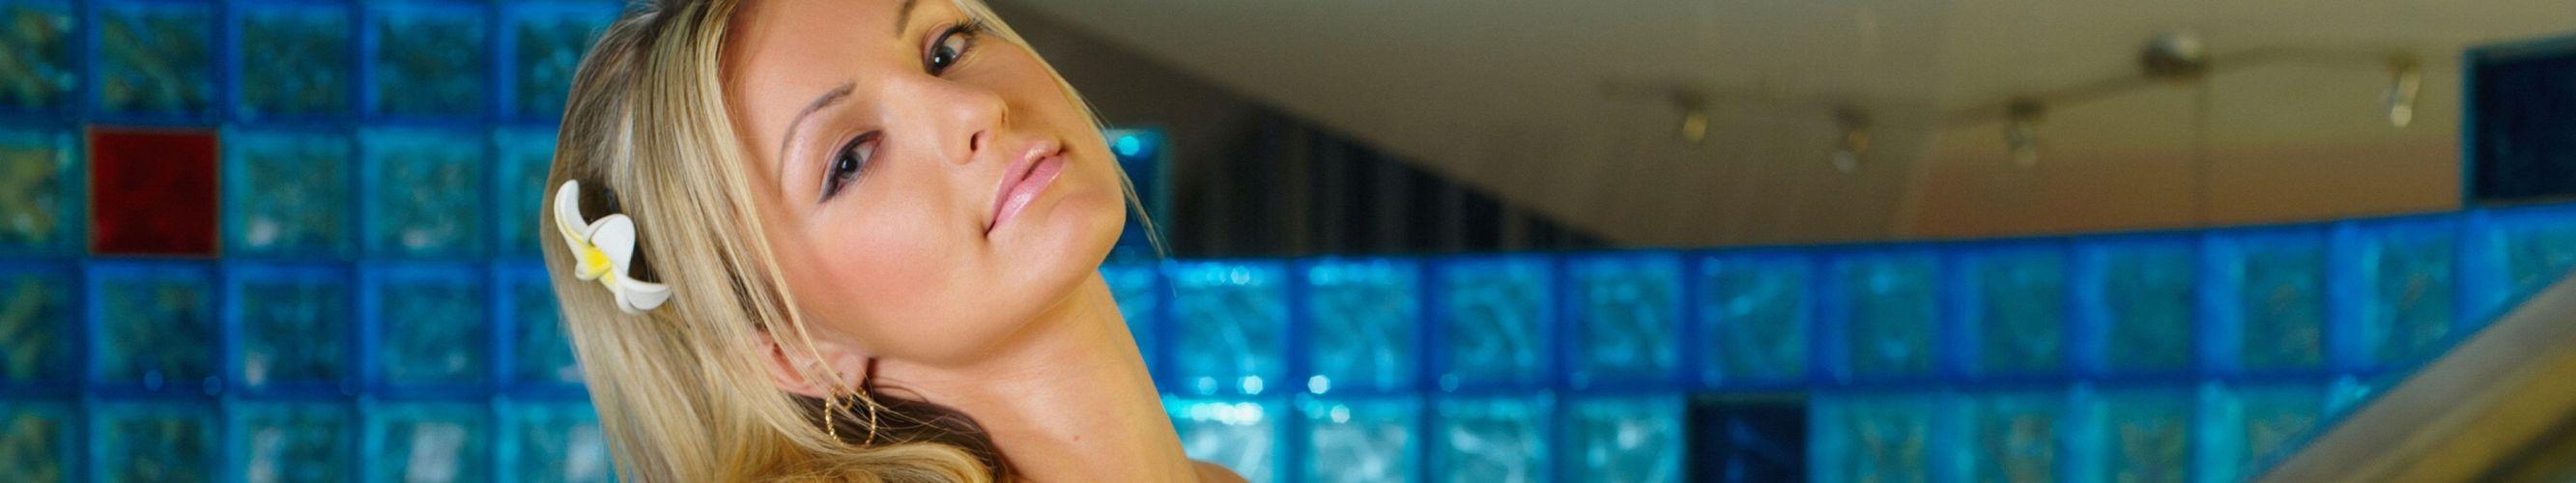 women nude Eyefinity wallpaper